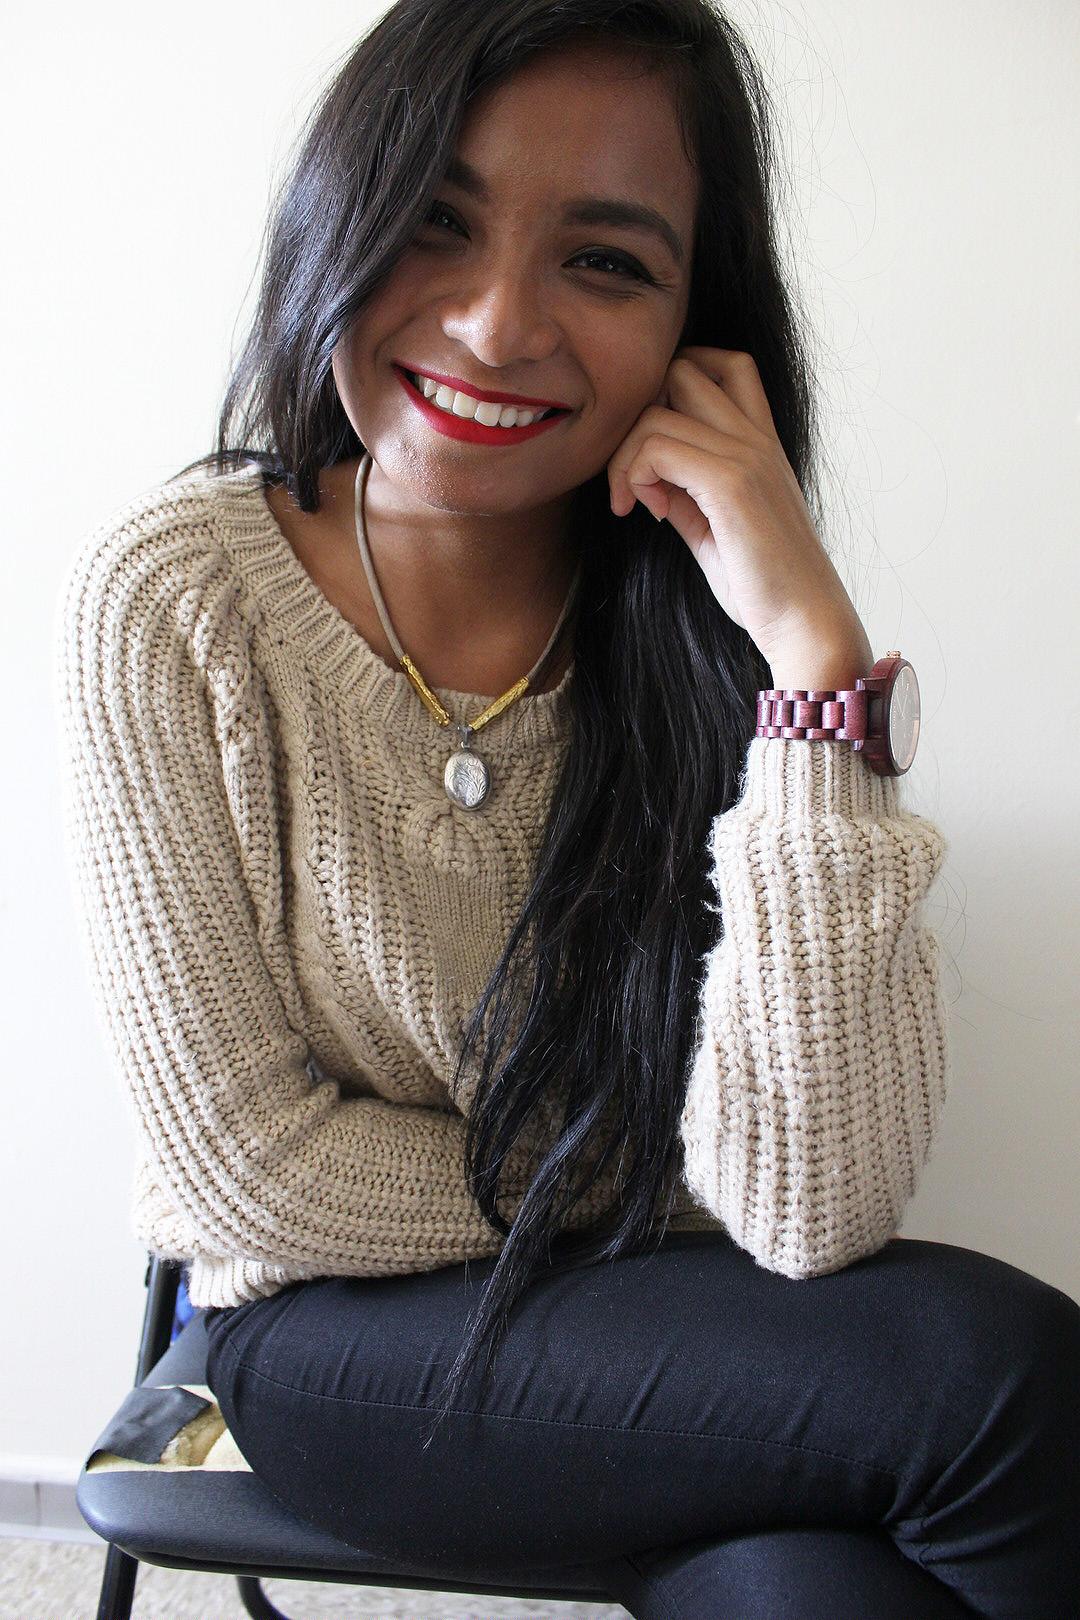 Beige-Sweater-Fall-Style-Blogger-Fashionista-lindatenchitran-2-1616x1080